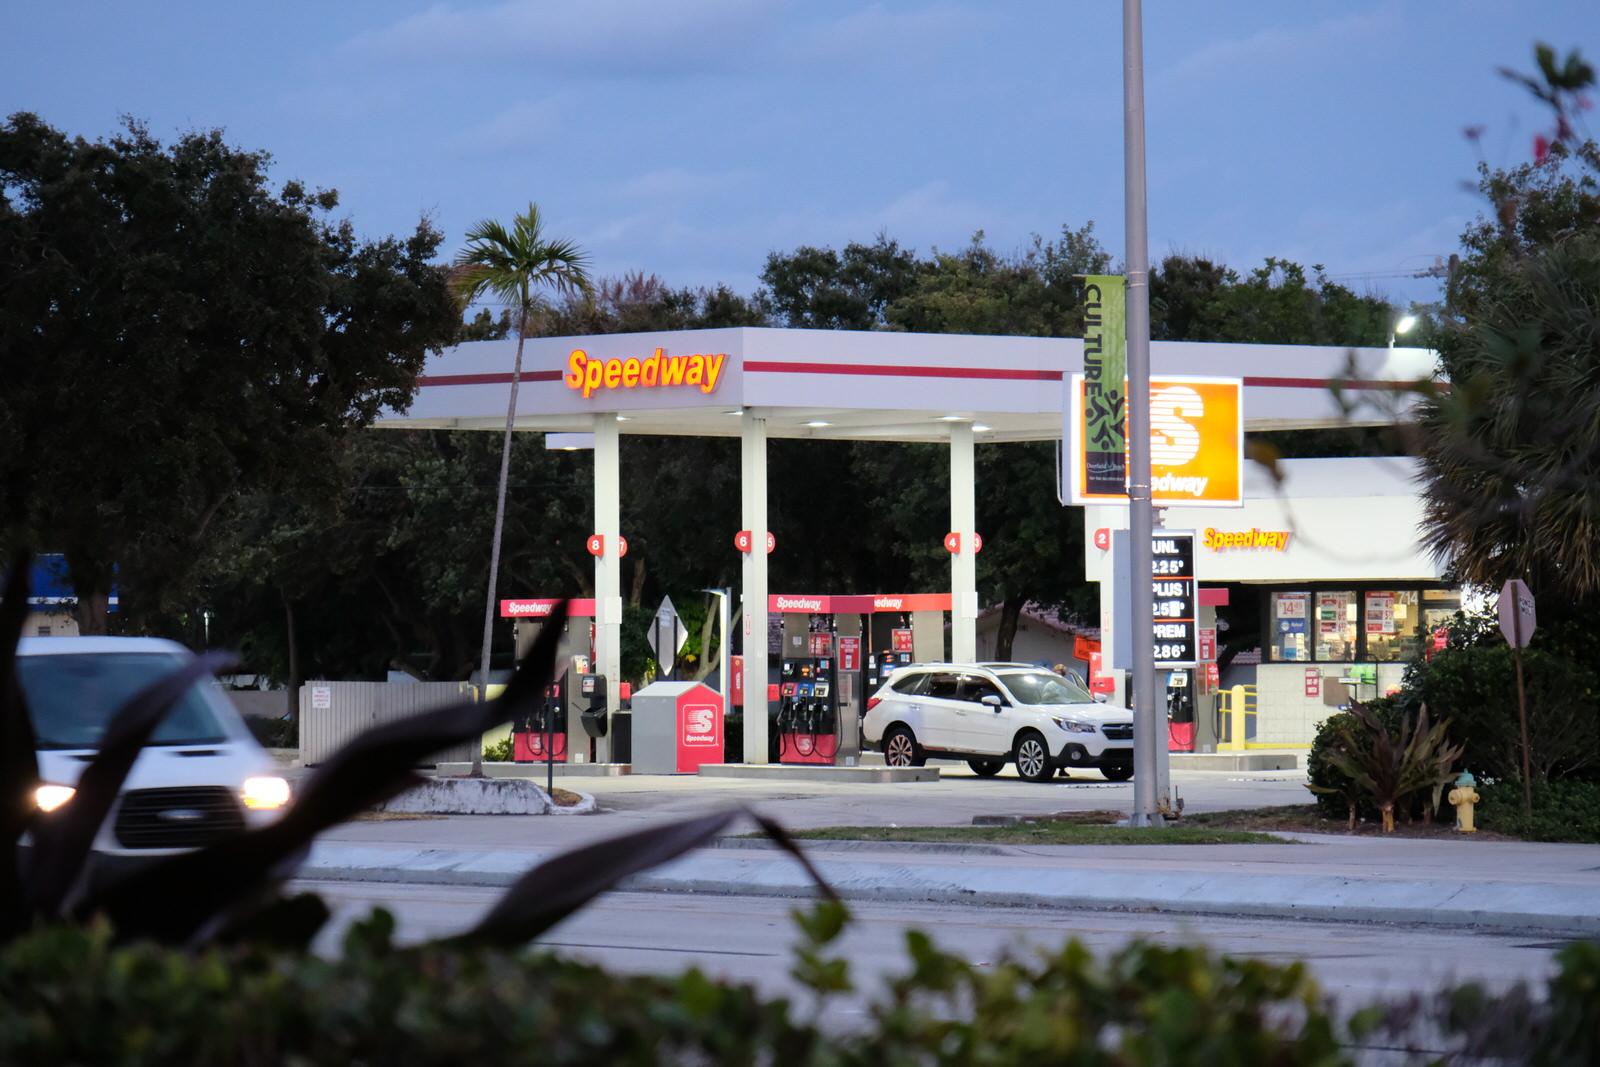 Speedway gas station in Pompano Beach, Florida.